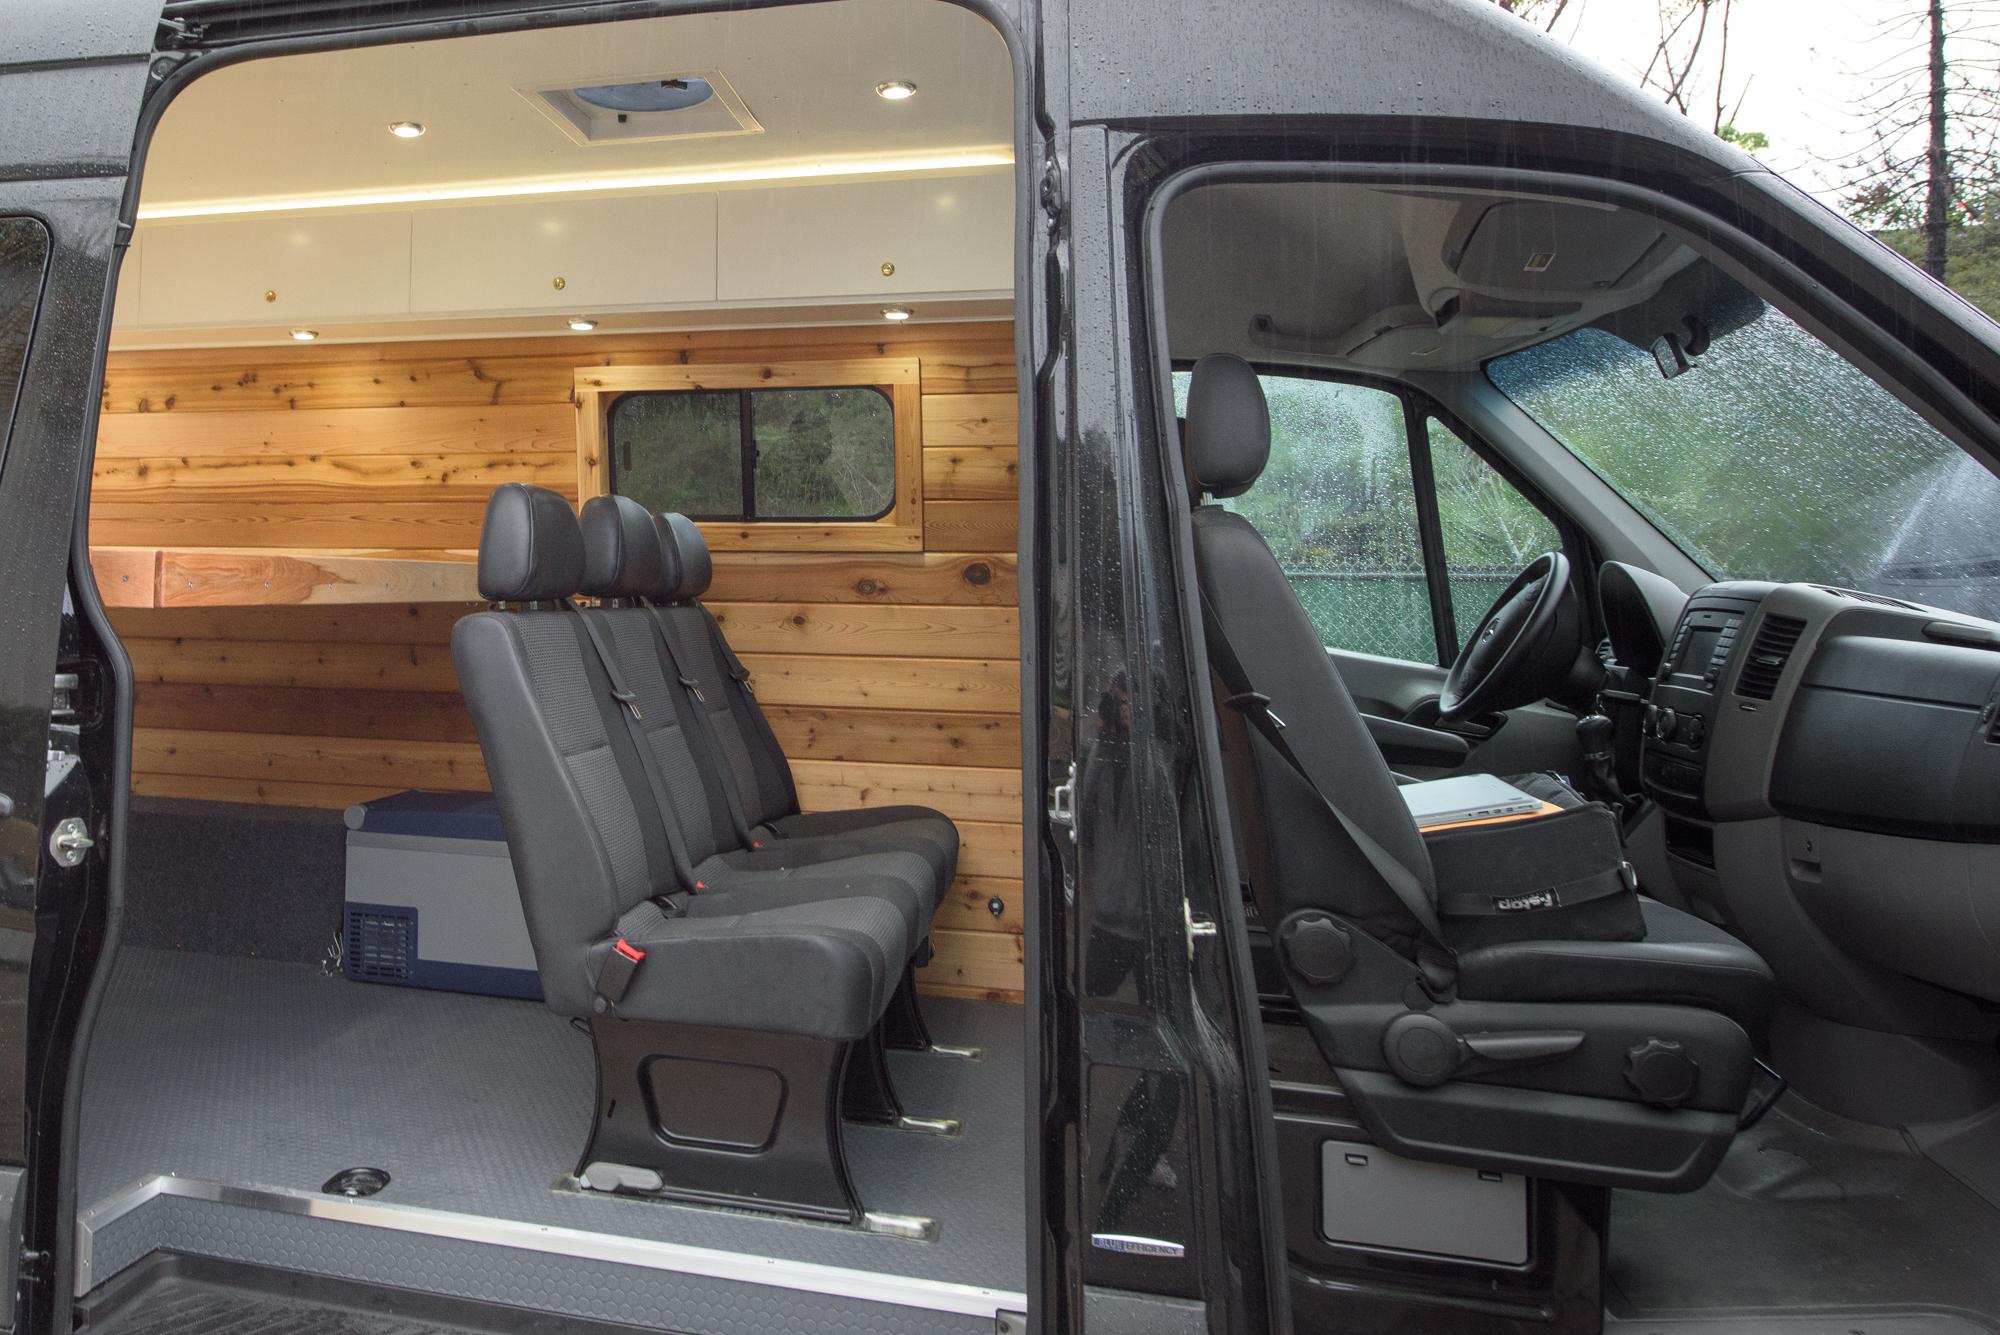 Stock 3 Passenger Mercedes Sprinter VanBench Seat - For Mercedes Sprinter® vans only.Quickly Removable.